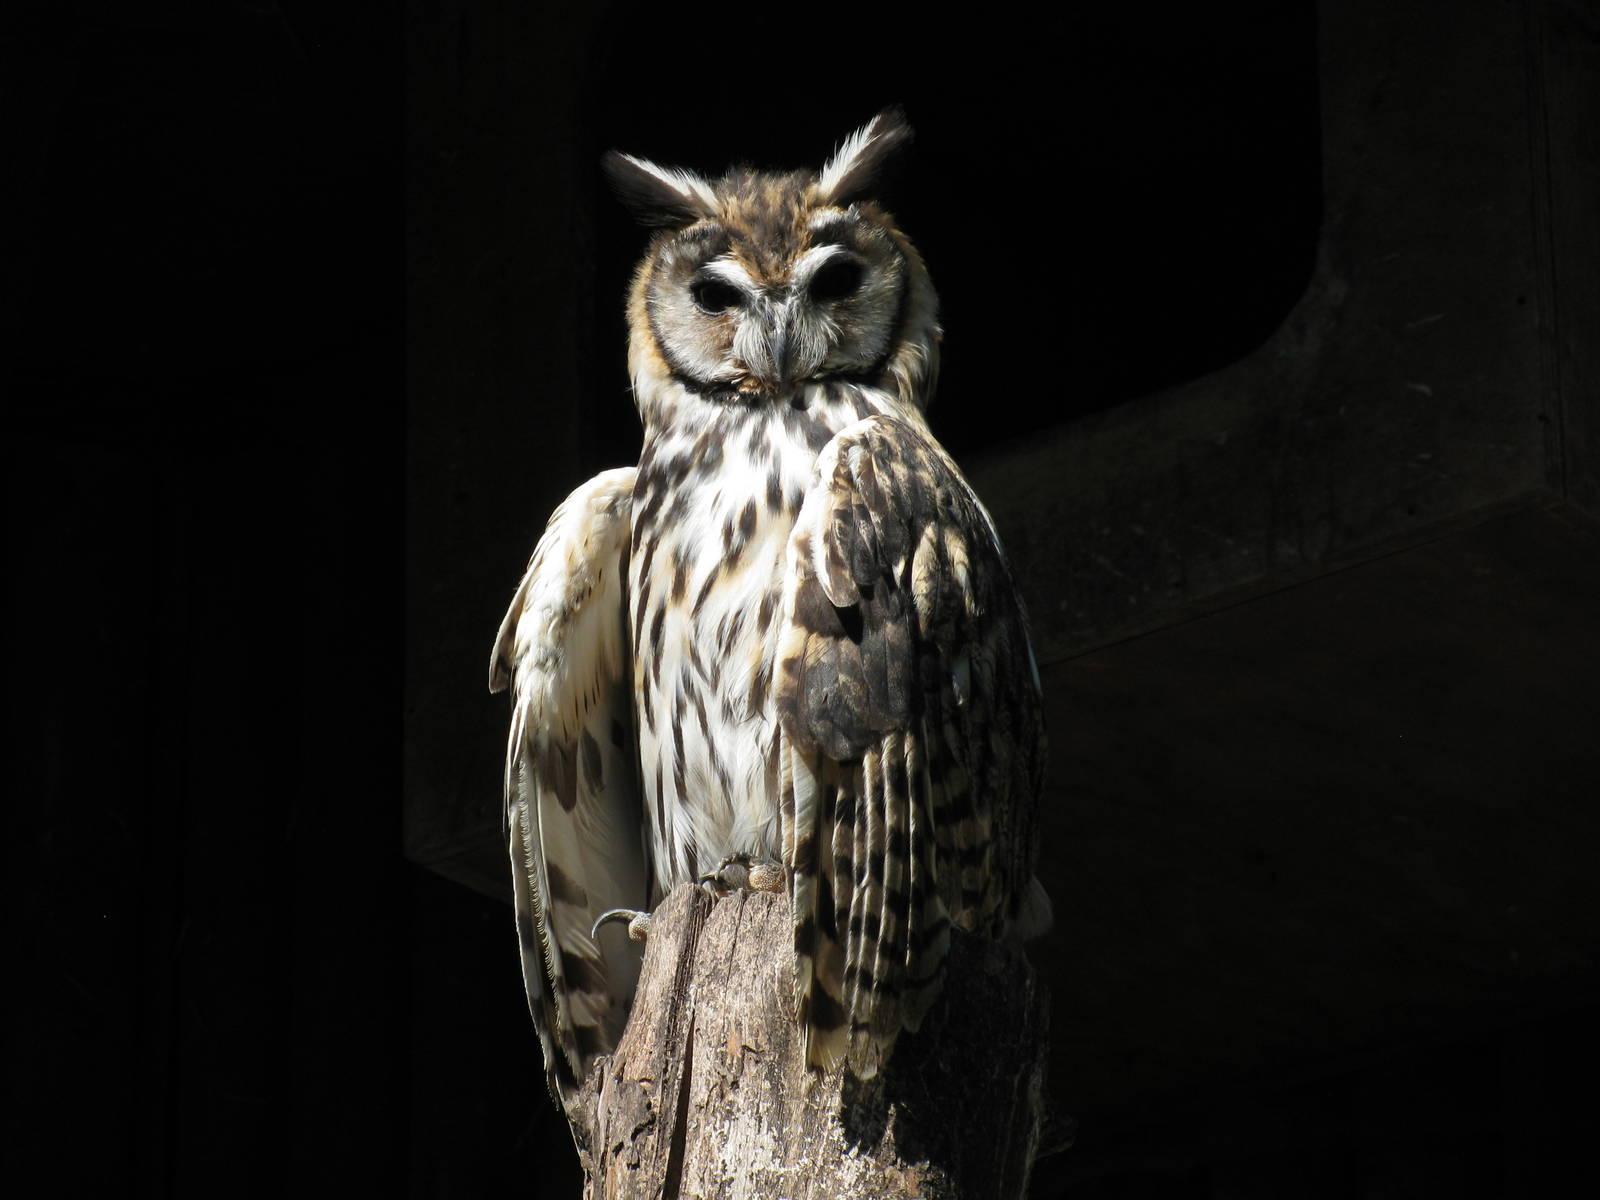 Striped Owl HD Wallpaper 20455